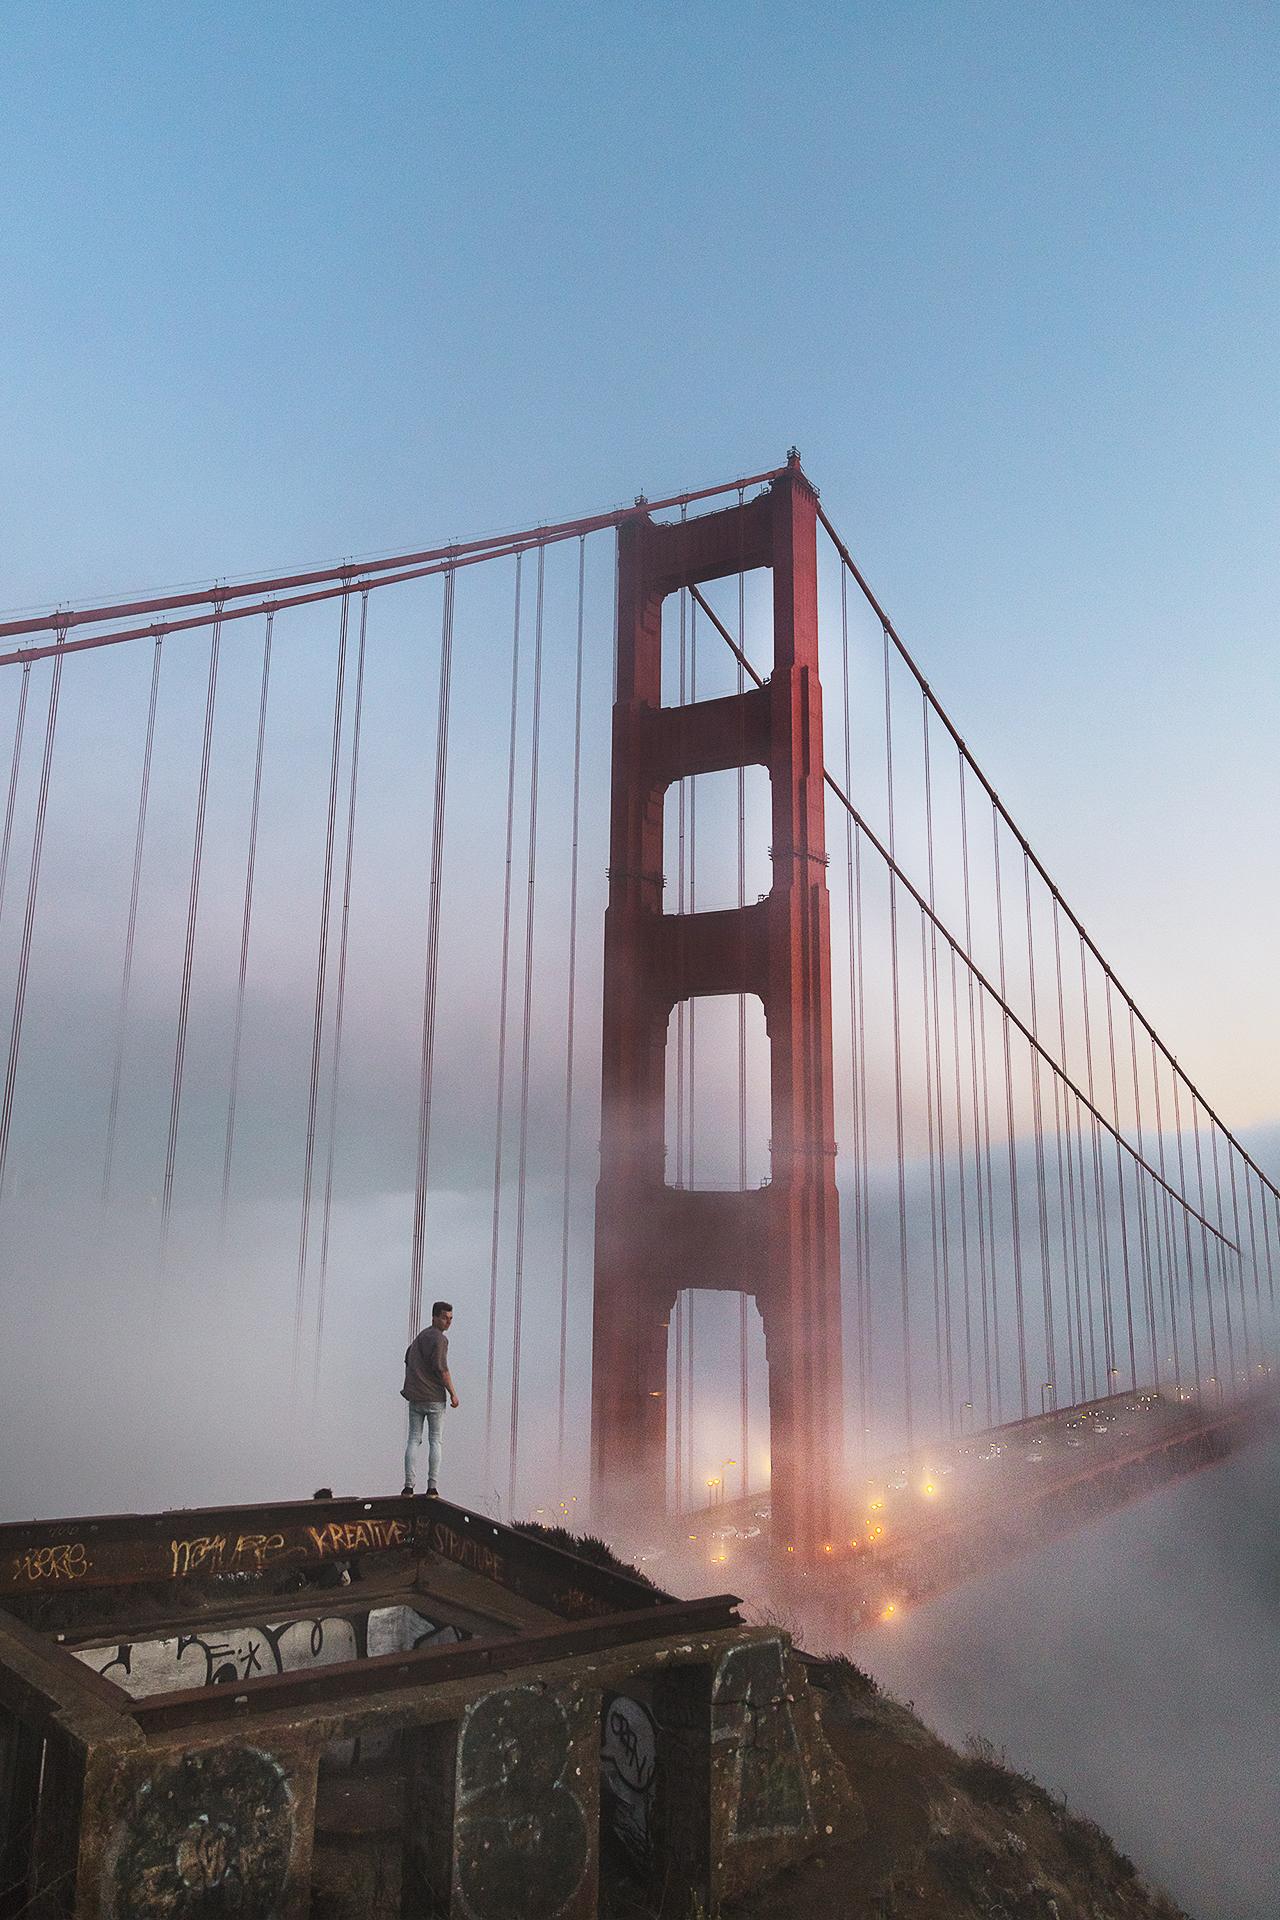 More Than Just Photos 657 - Golden Gate Bridge